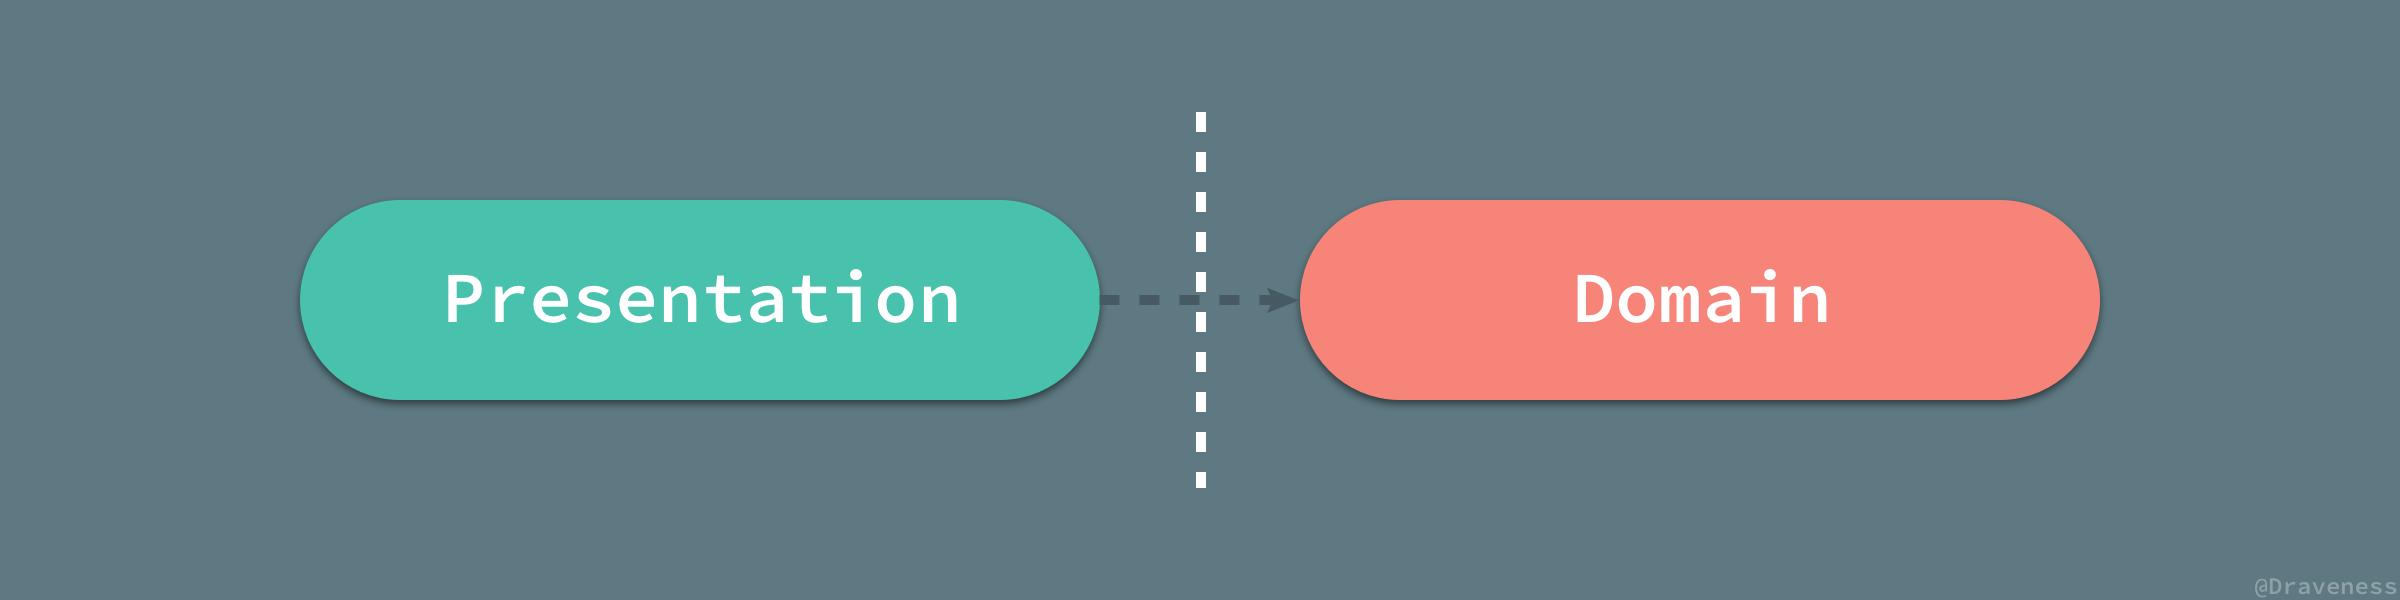 Presentation-Domain